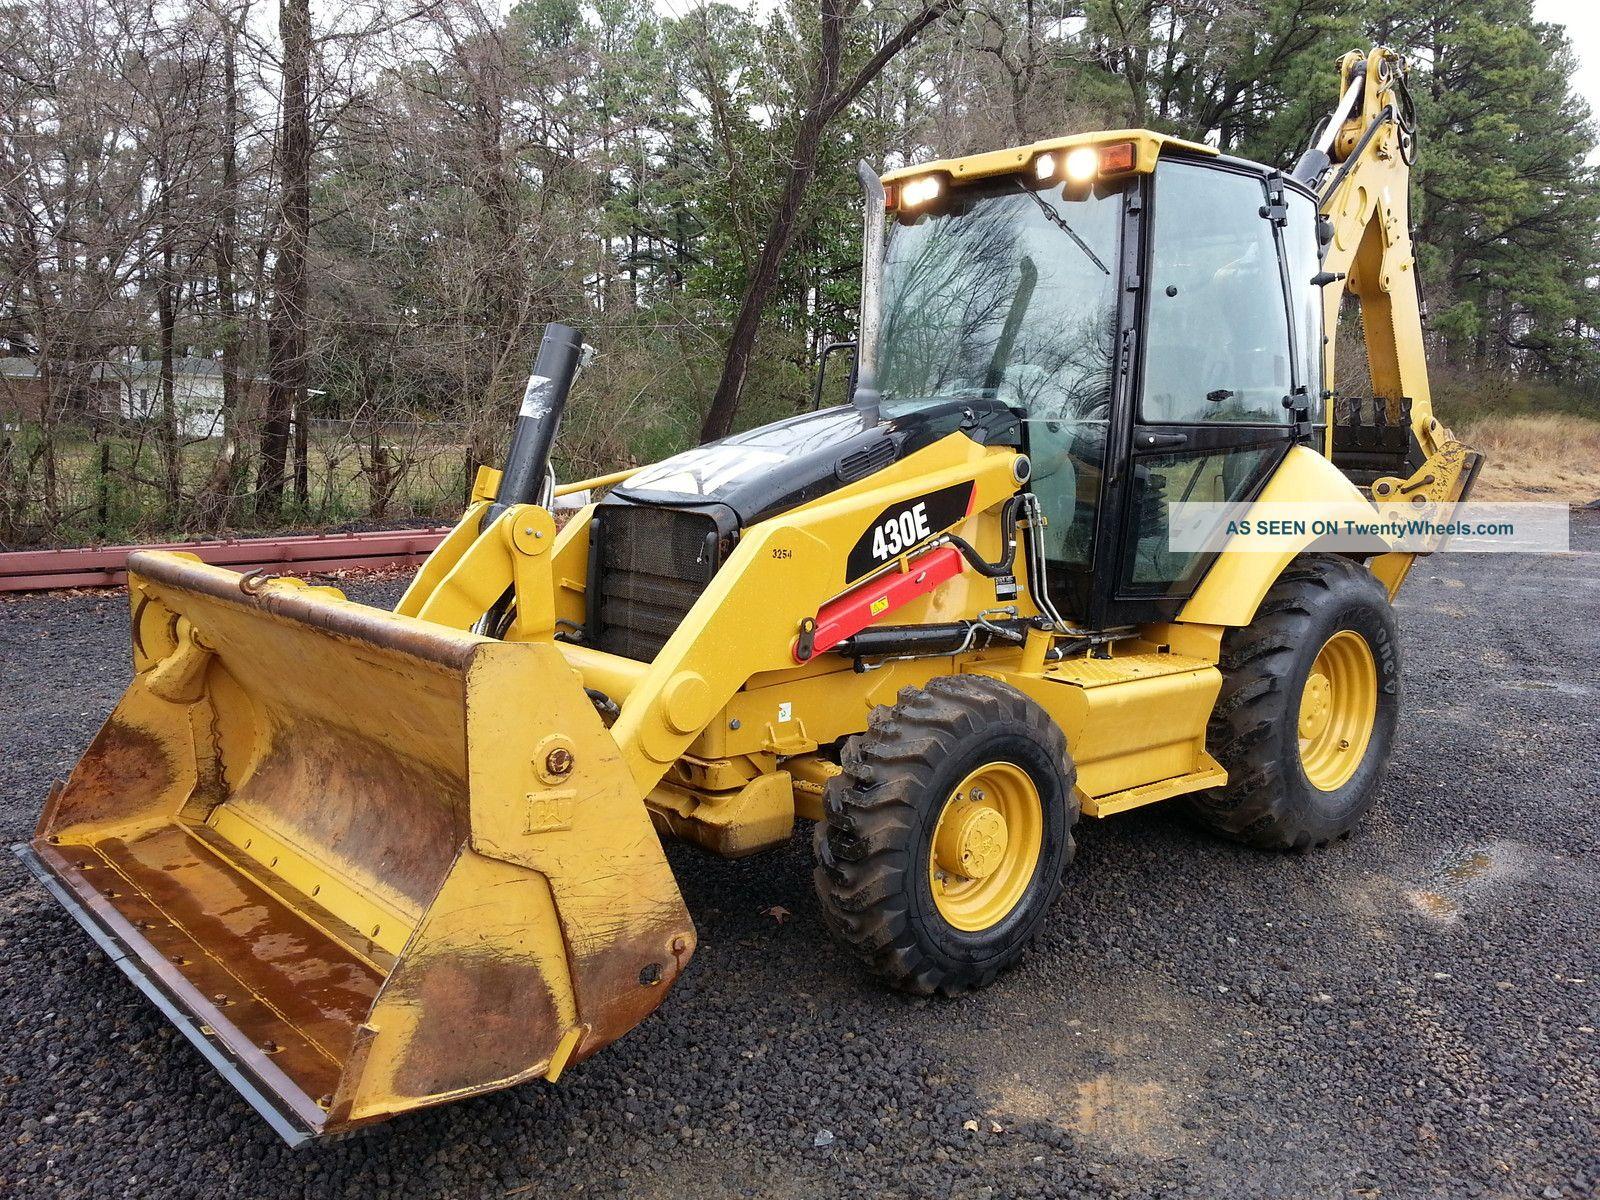 2010 Cat Caterpillar 430e Loader Backhoe; 4 - 1,  Extenda - Hoe,  A/c Cab,  2050 Hrs Backhoe Loaders photo